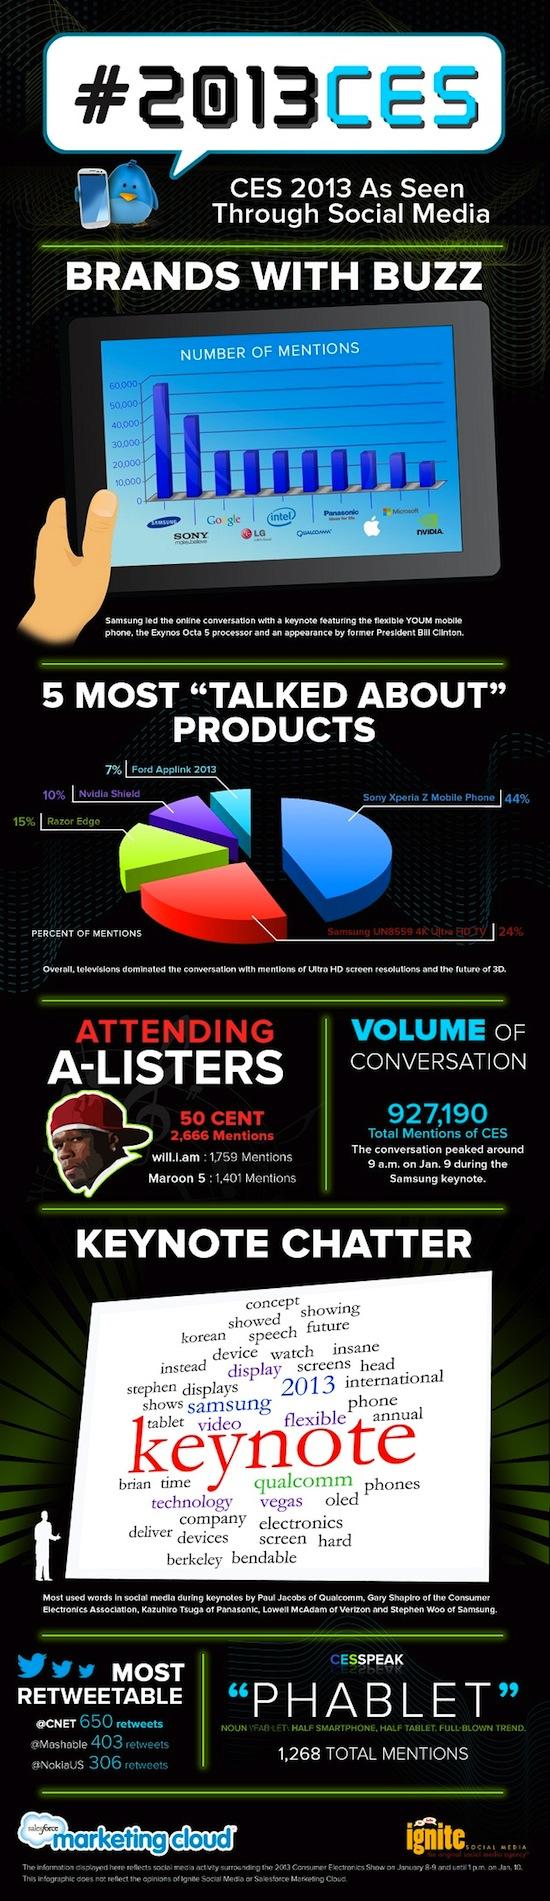 infographie CES 2013 médias sociaux